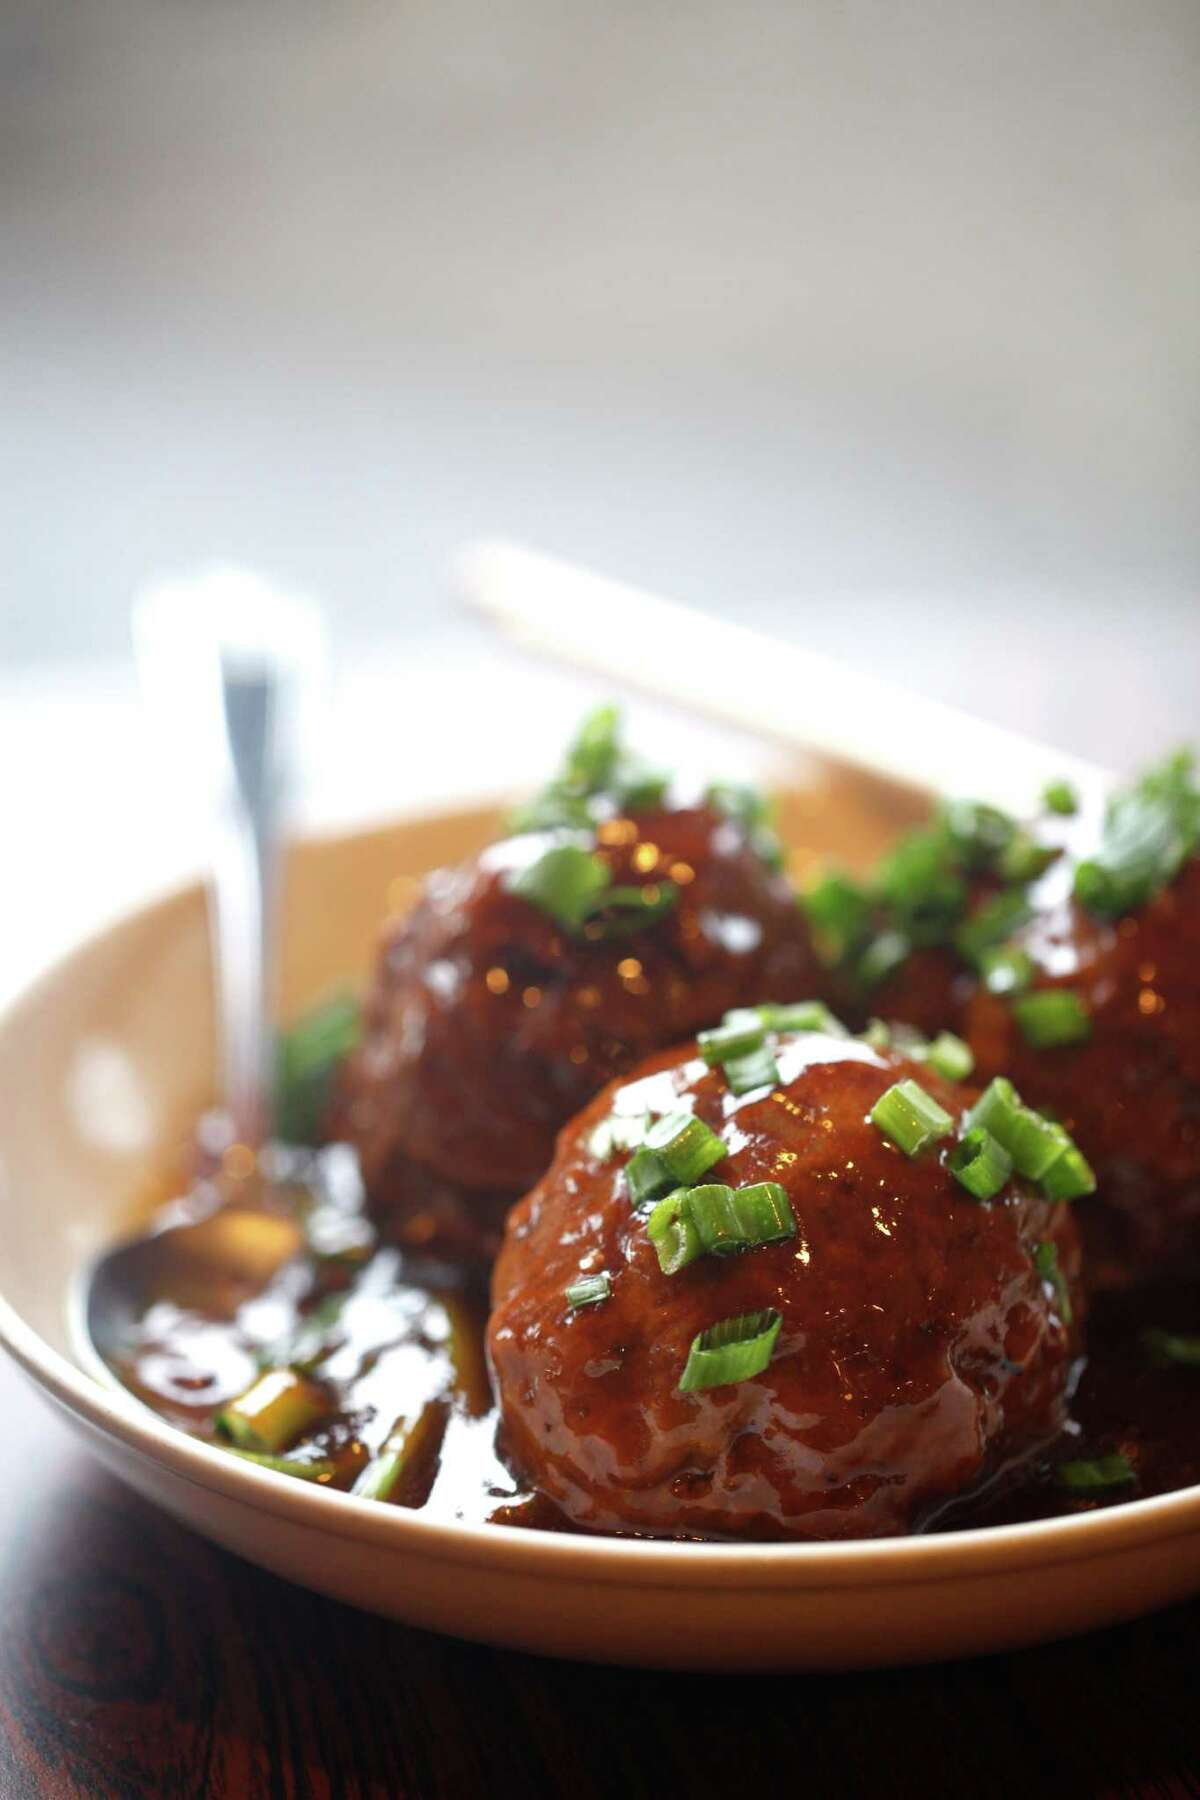 Shanghai Dumpling King's Lion's Head Meatballs.